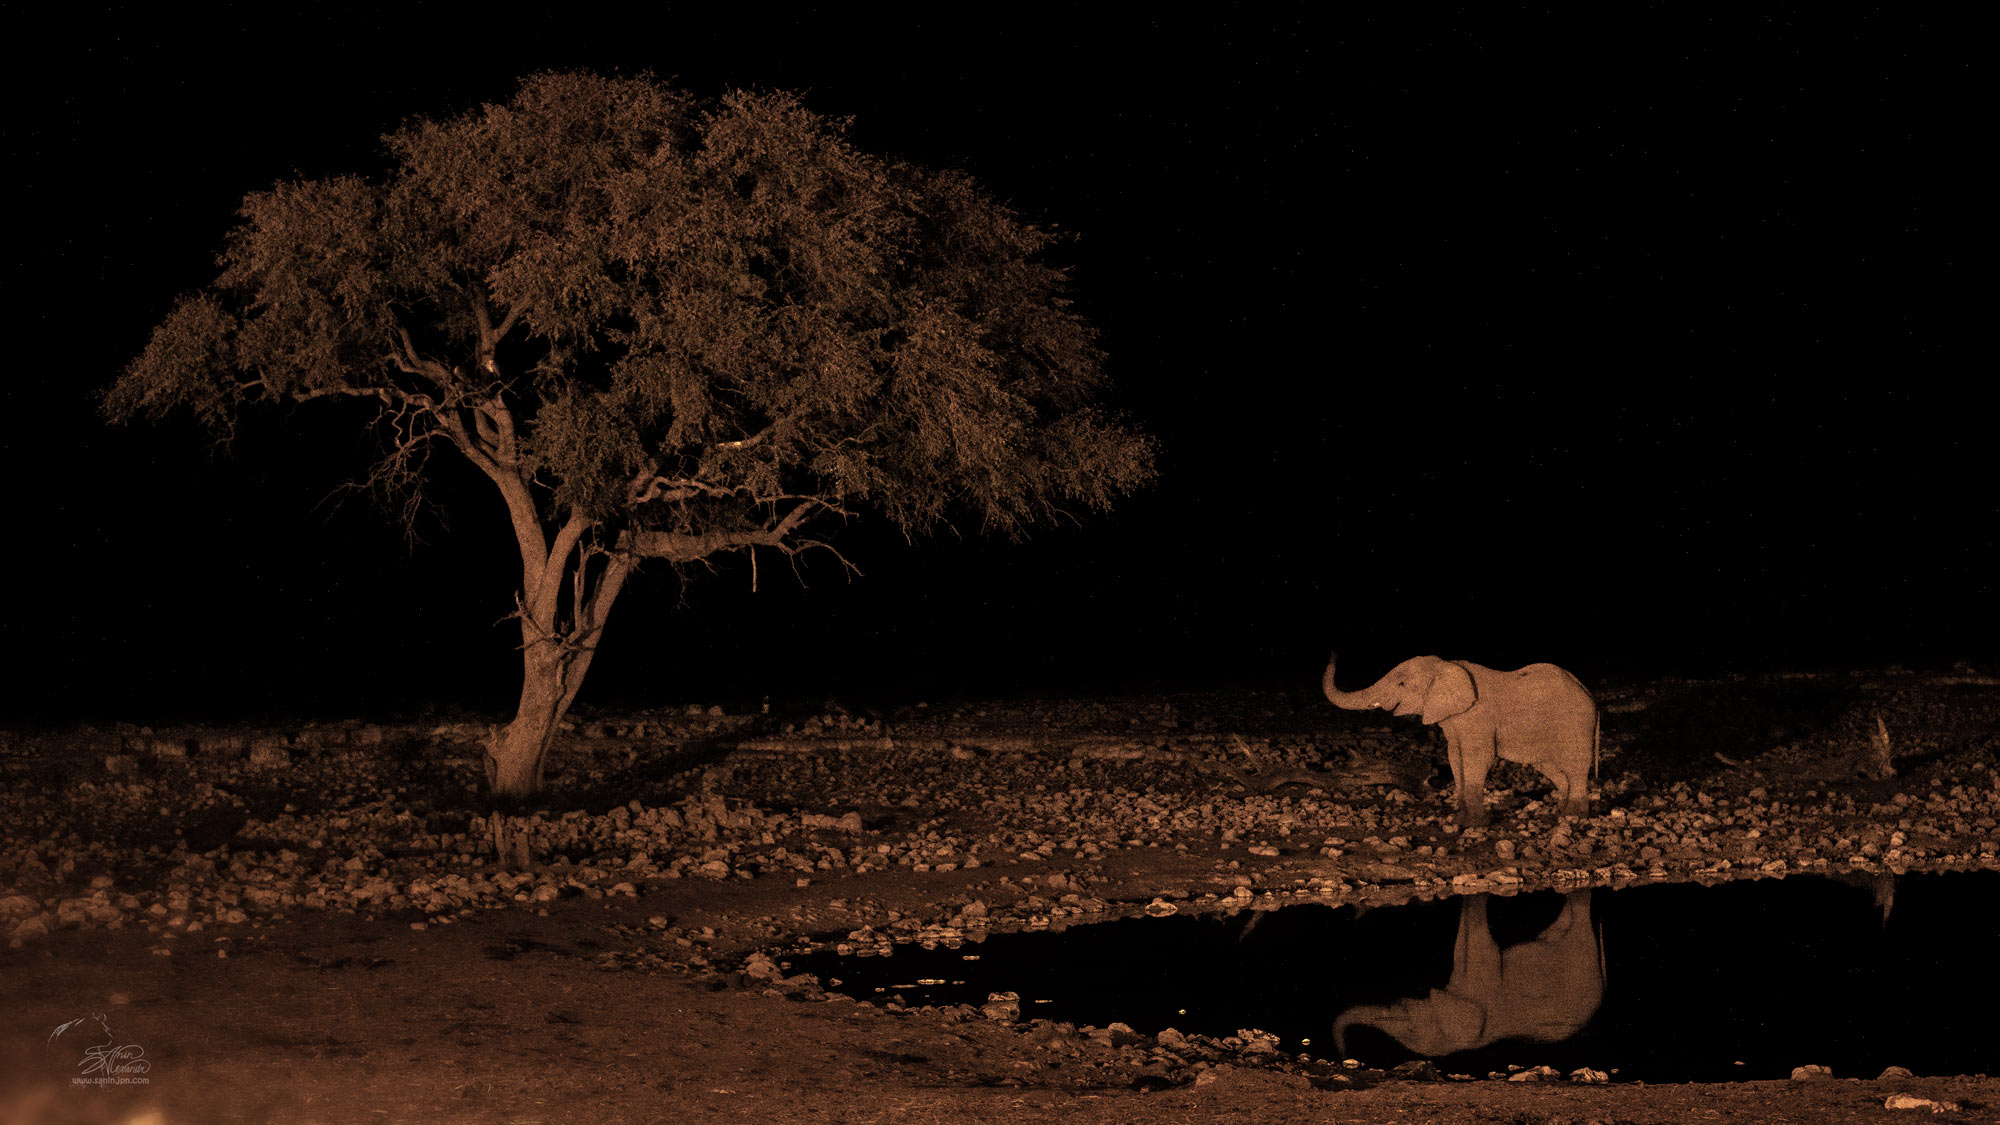 Waterhole at night in Etosha NP.Namibia